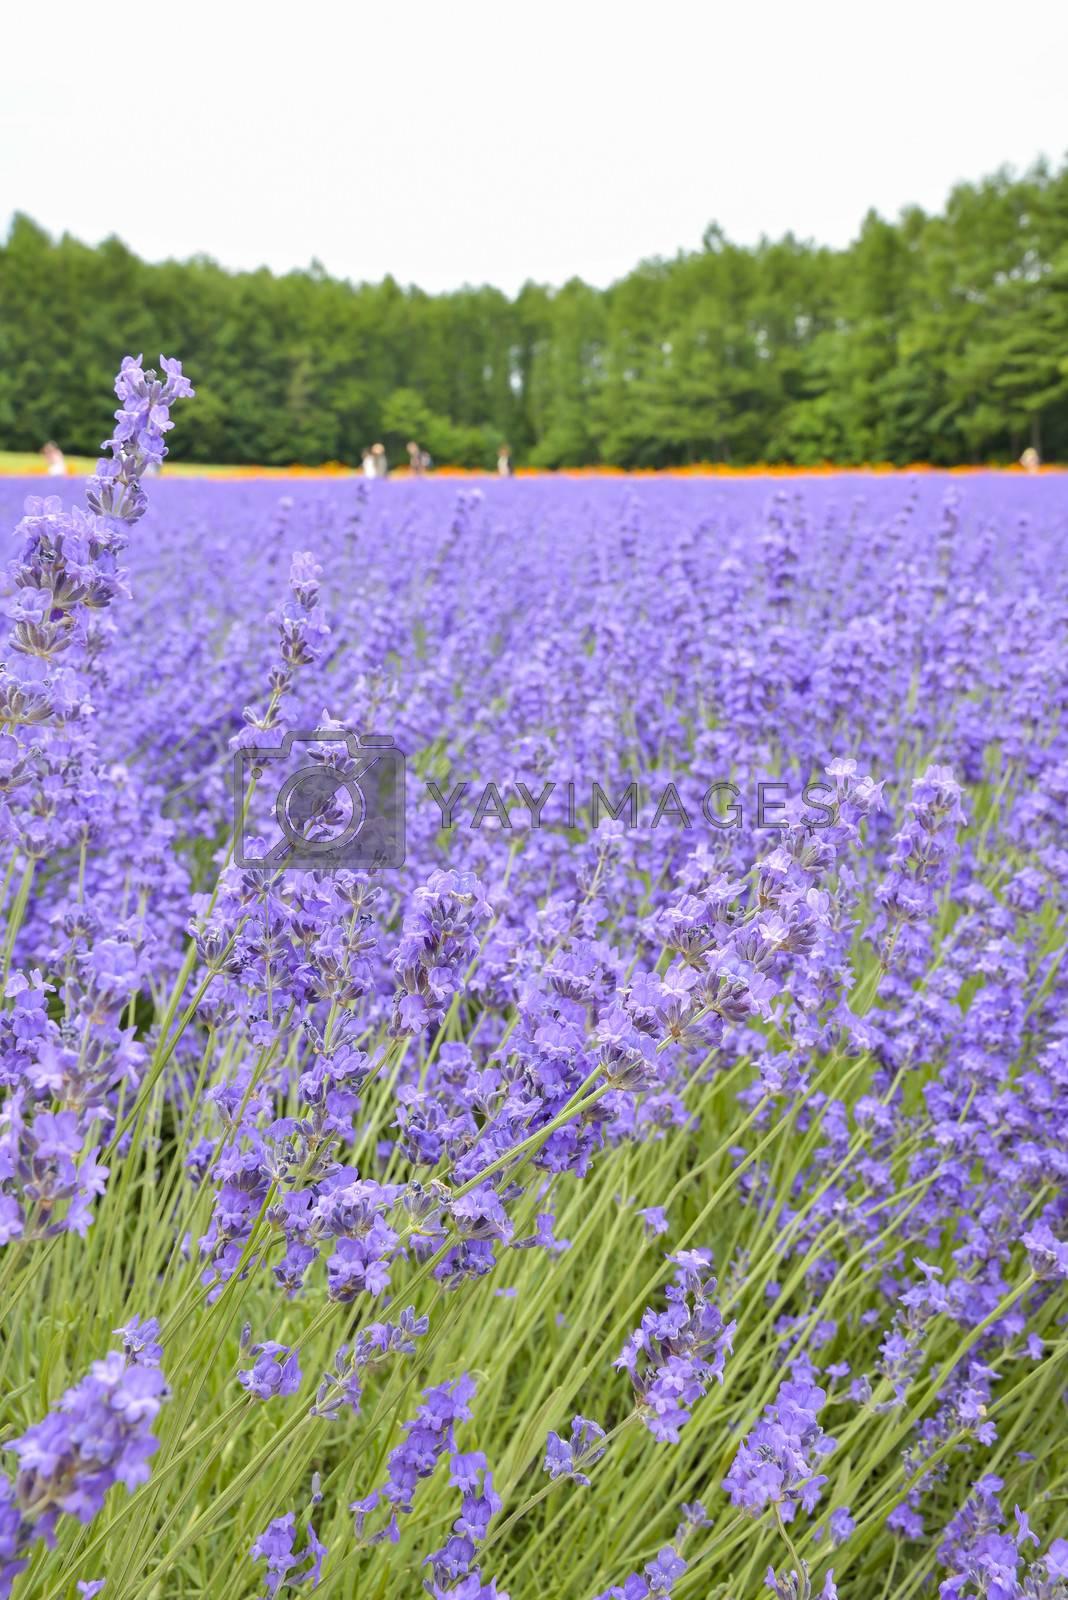 Colorful Lavender farm6